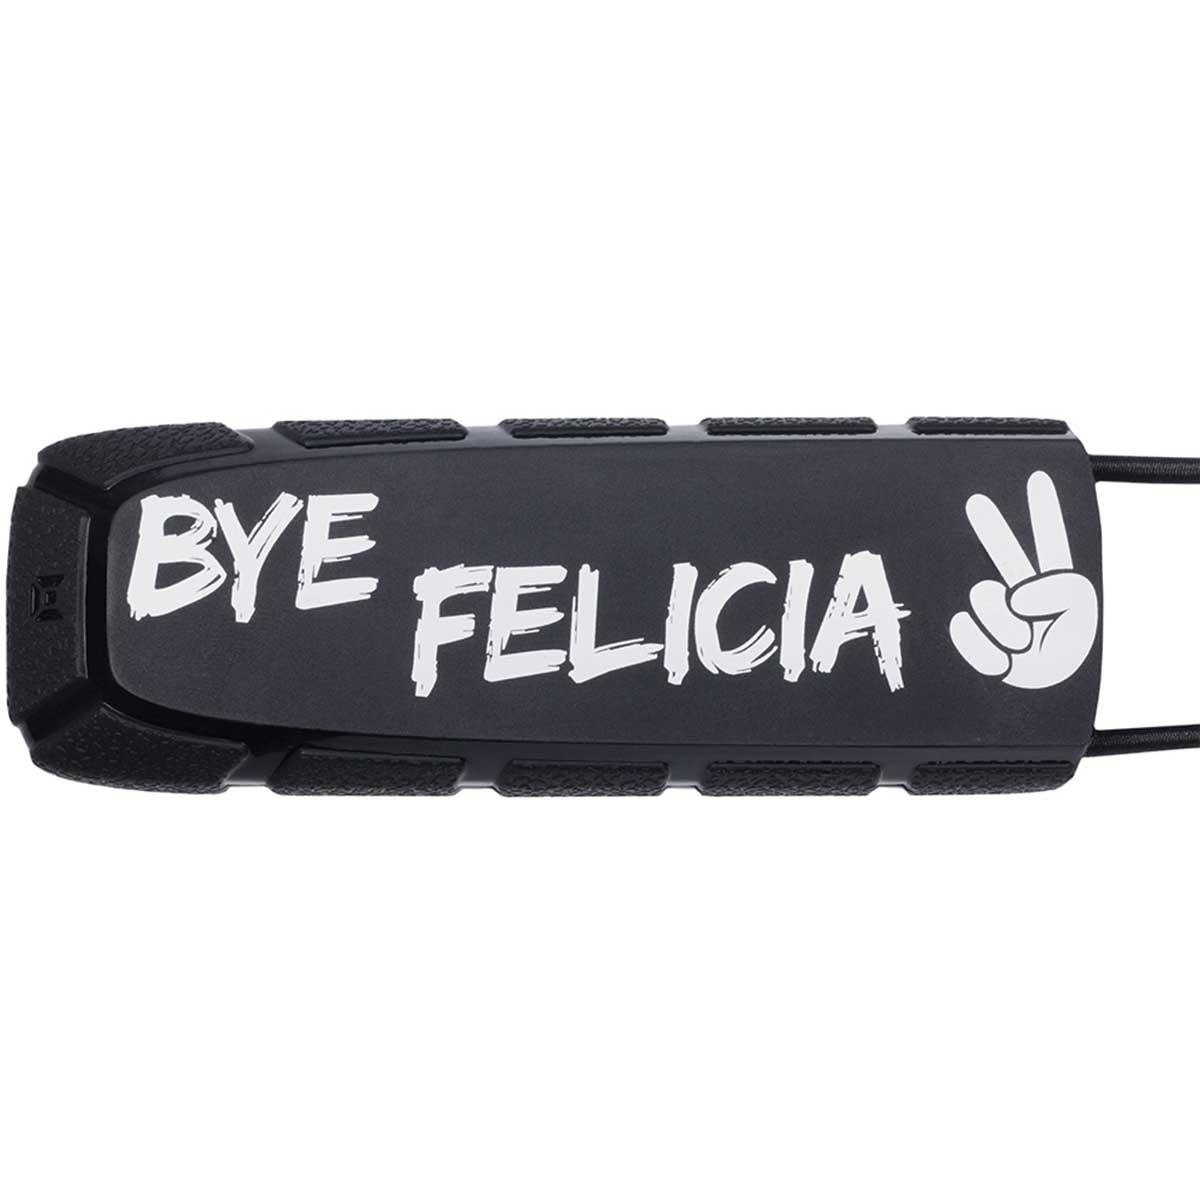 Exalt Paintball Bayonet Barrel Condom   Cover LE Bye Felicia by Exalt